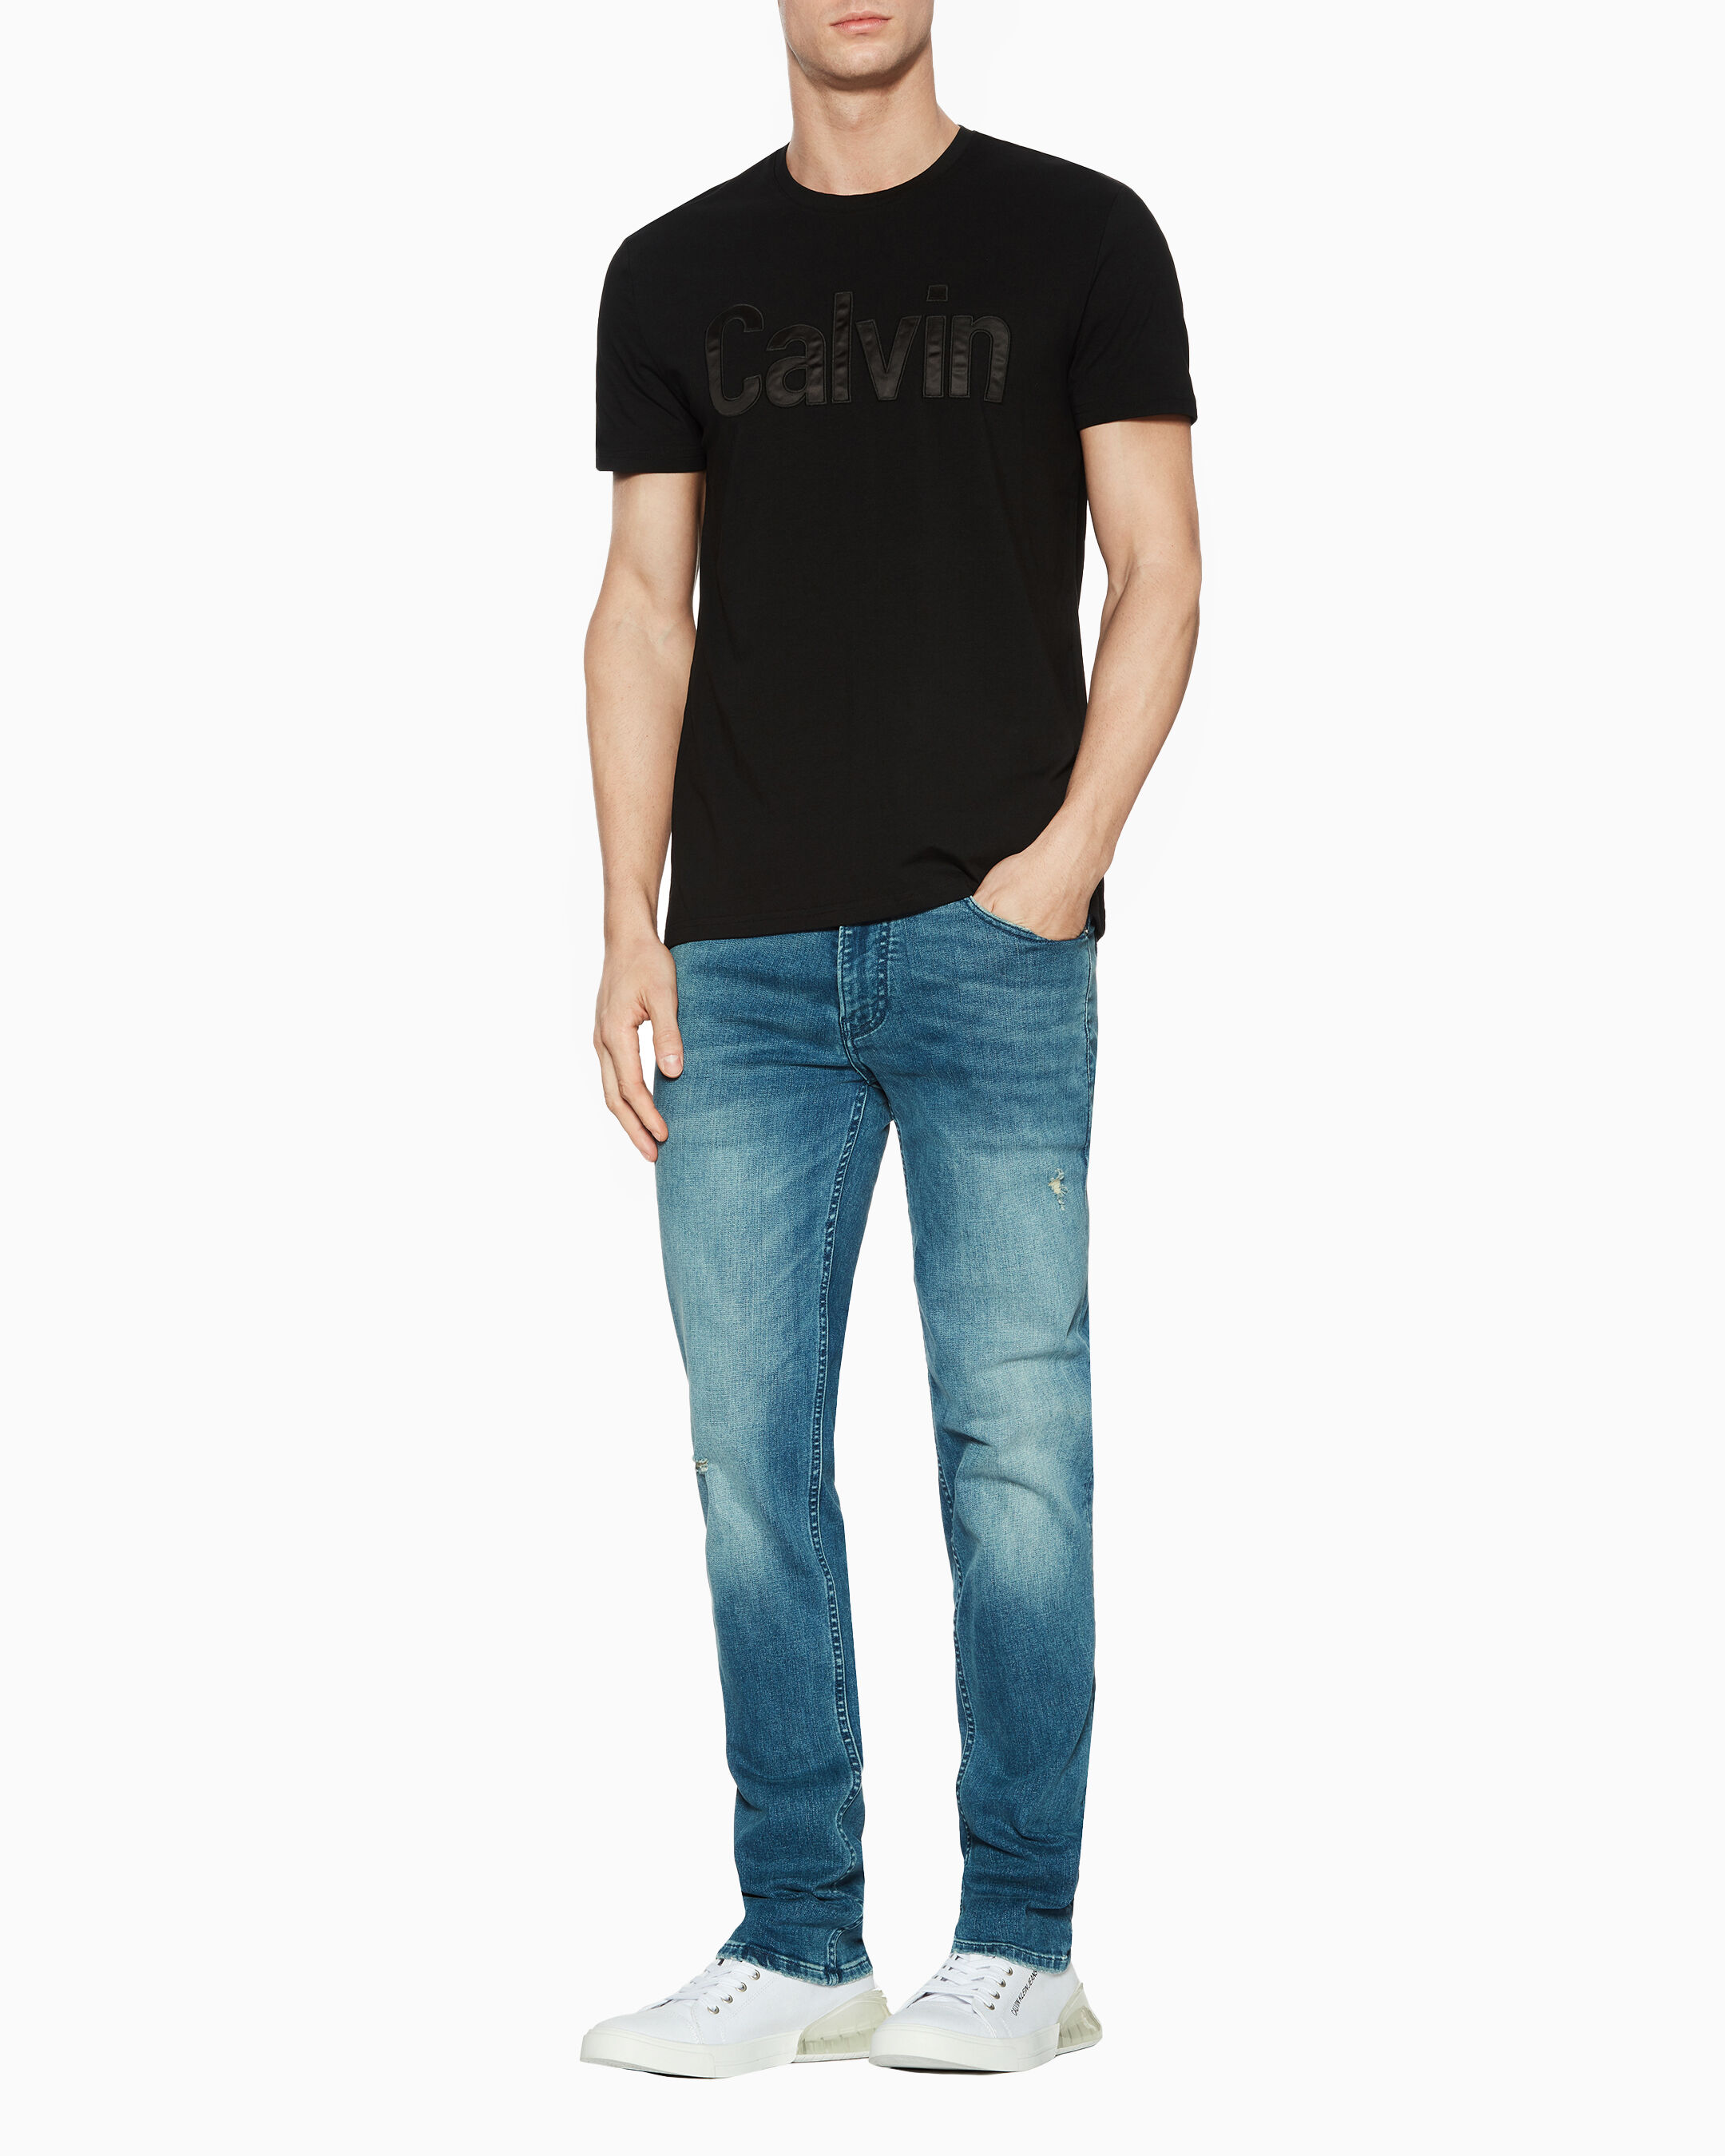 Calvin Klein Jeans Women's CK Shiny Box T Shirt Black